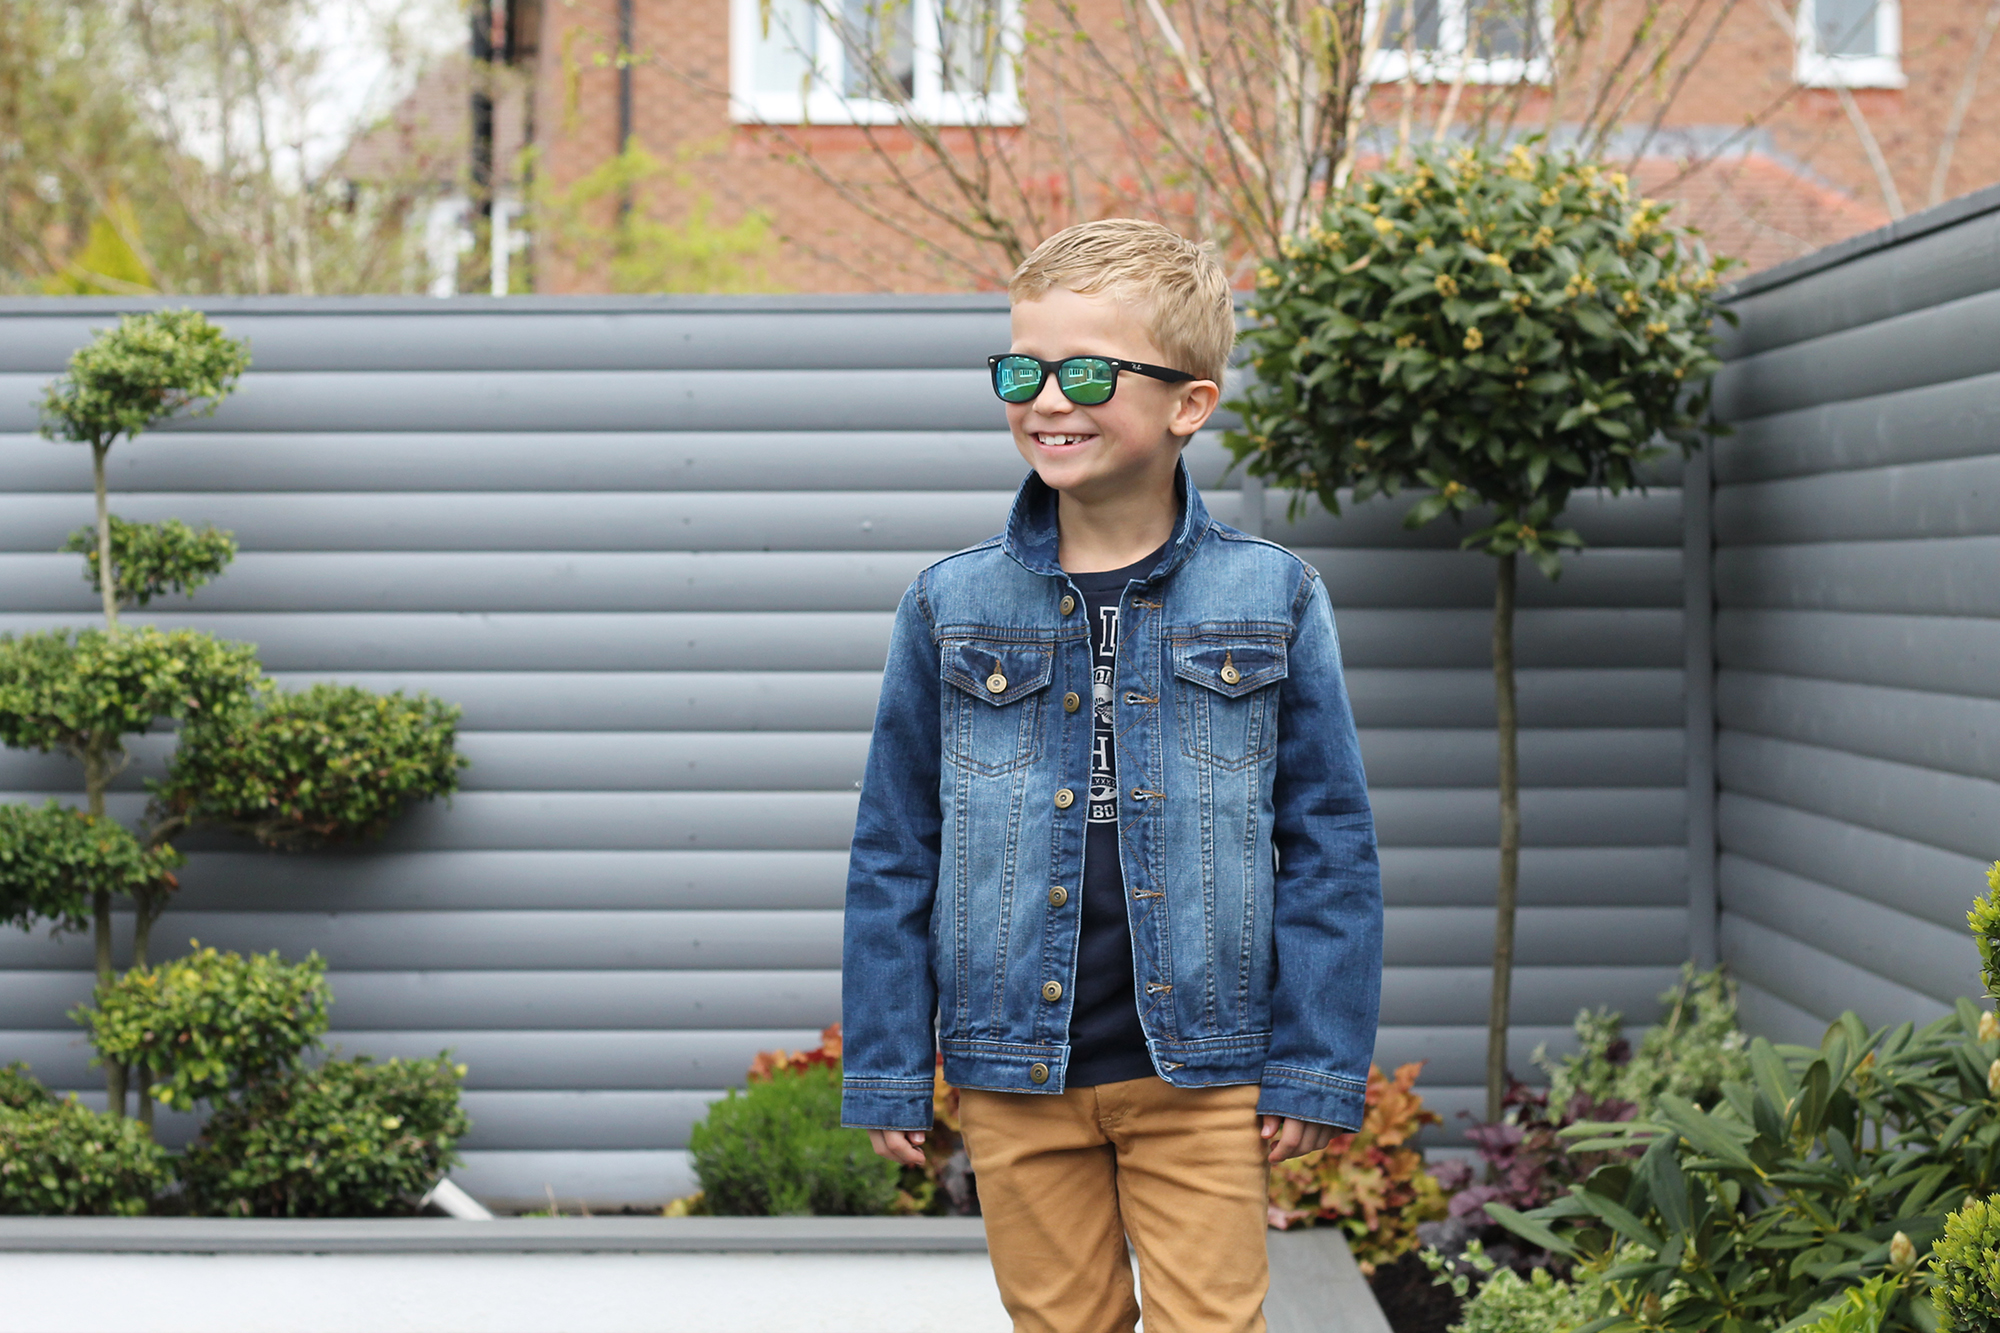 Little Cigogne Kid's shopping online subscription kids stylist services kids fashion